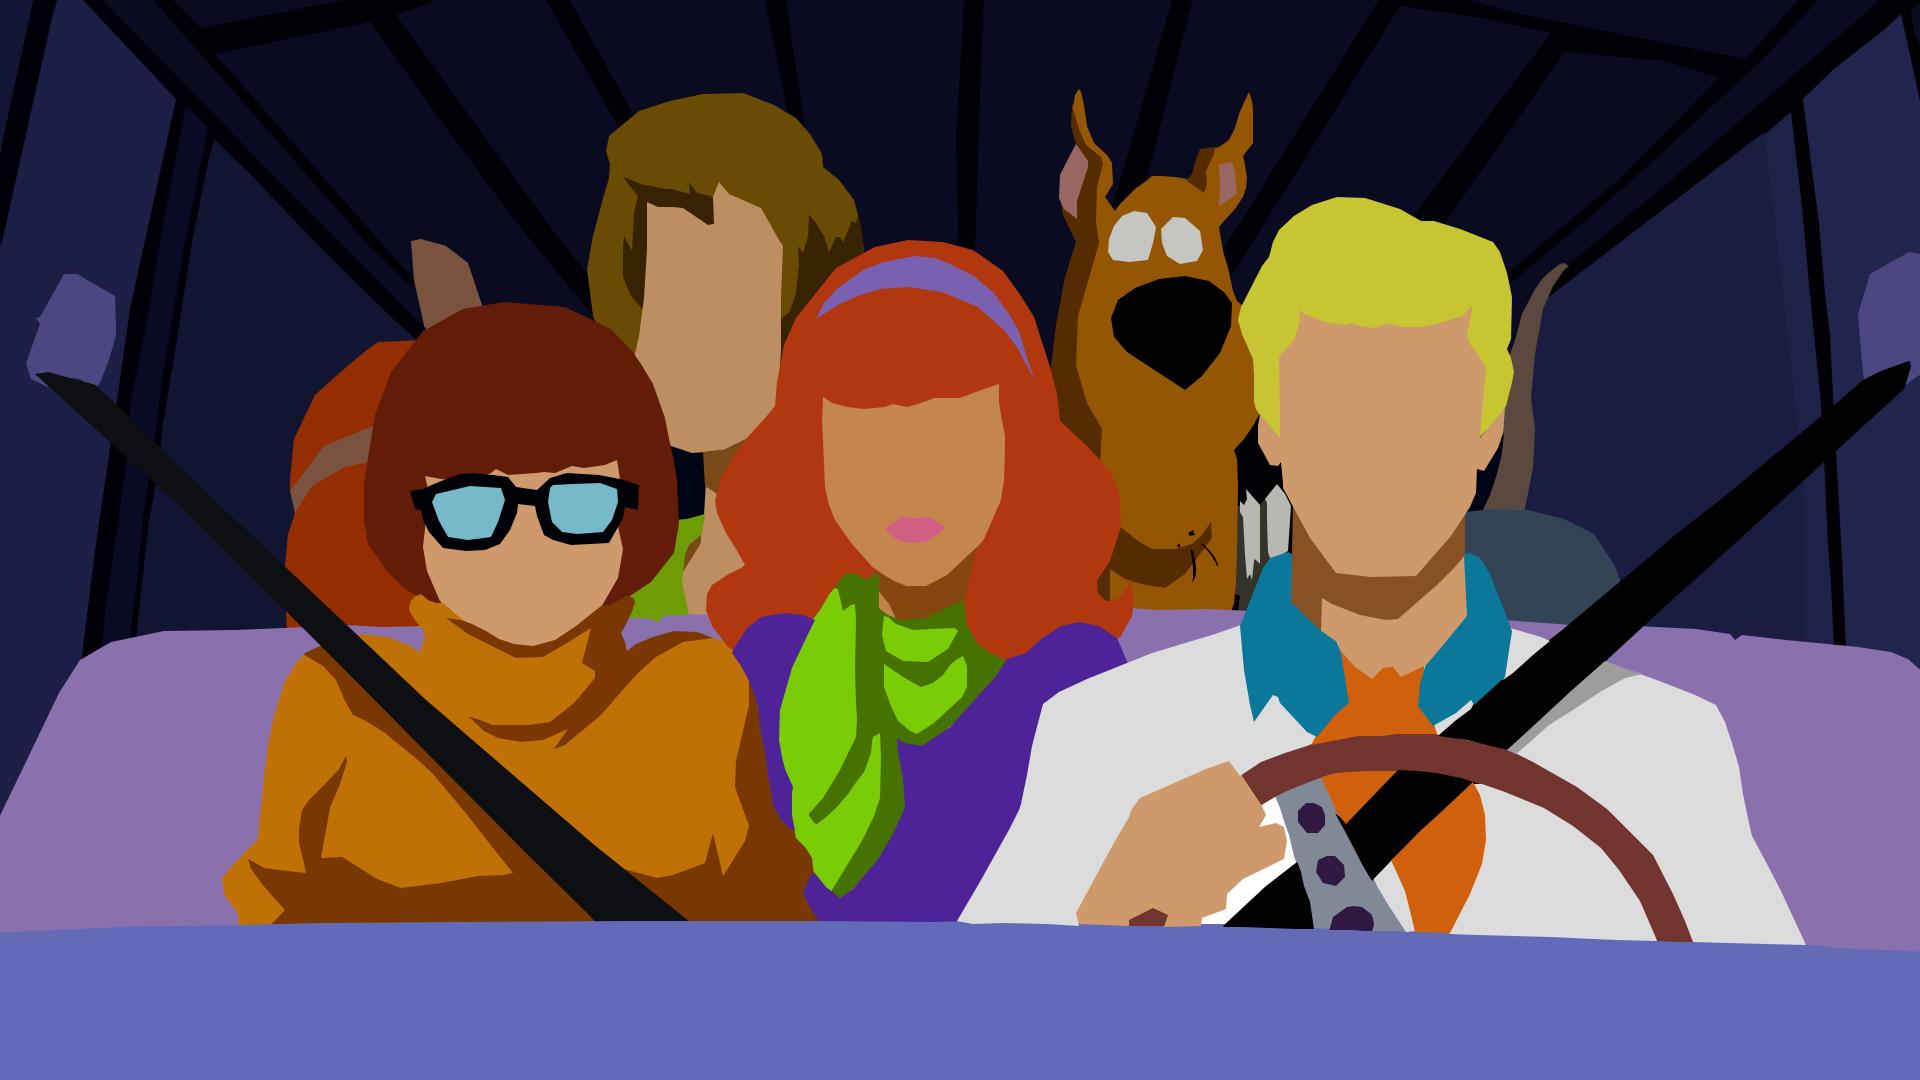 Scooby Doo Gang [1920x1080]